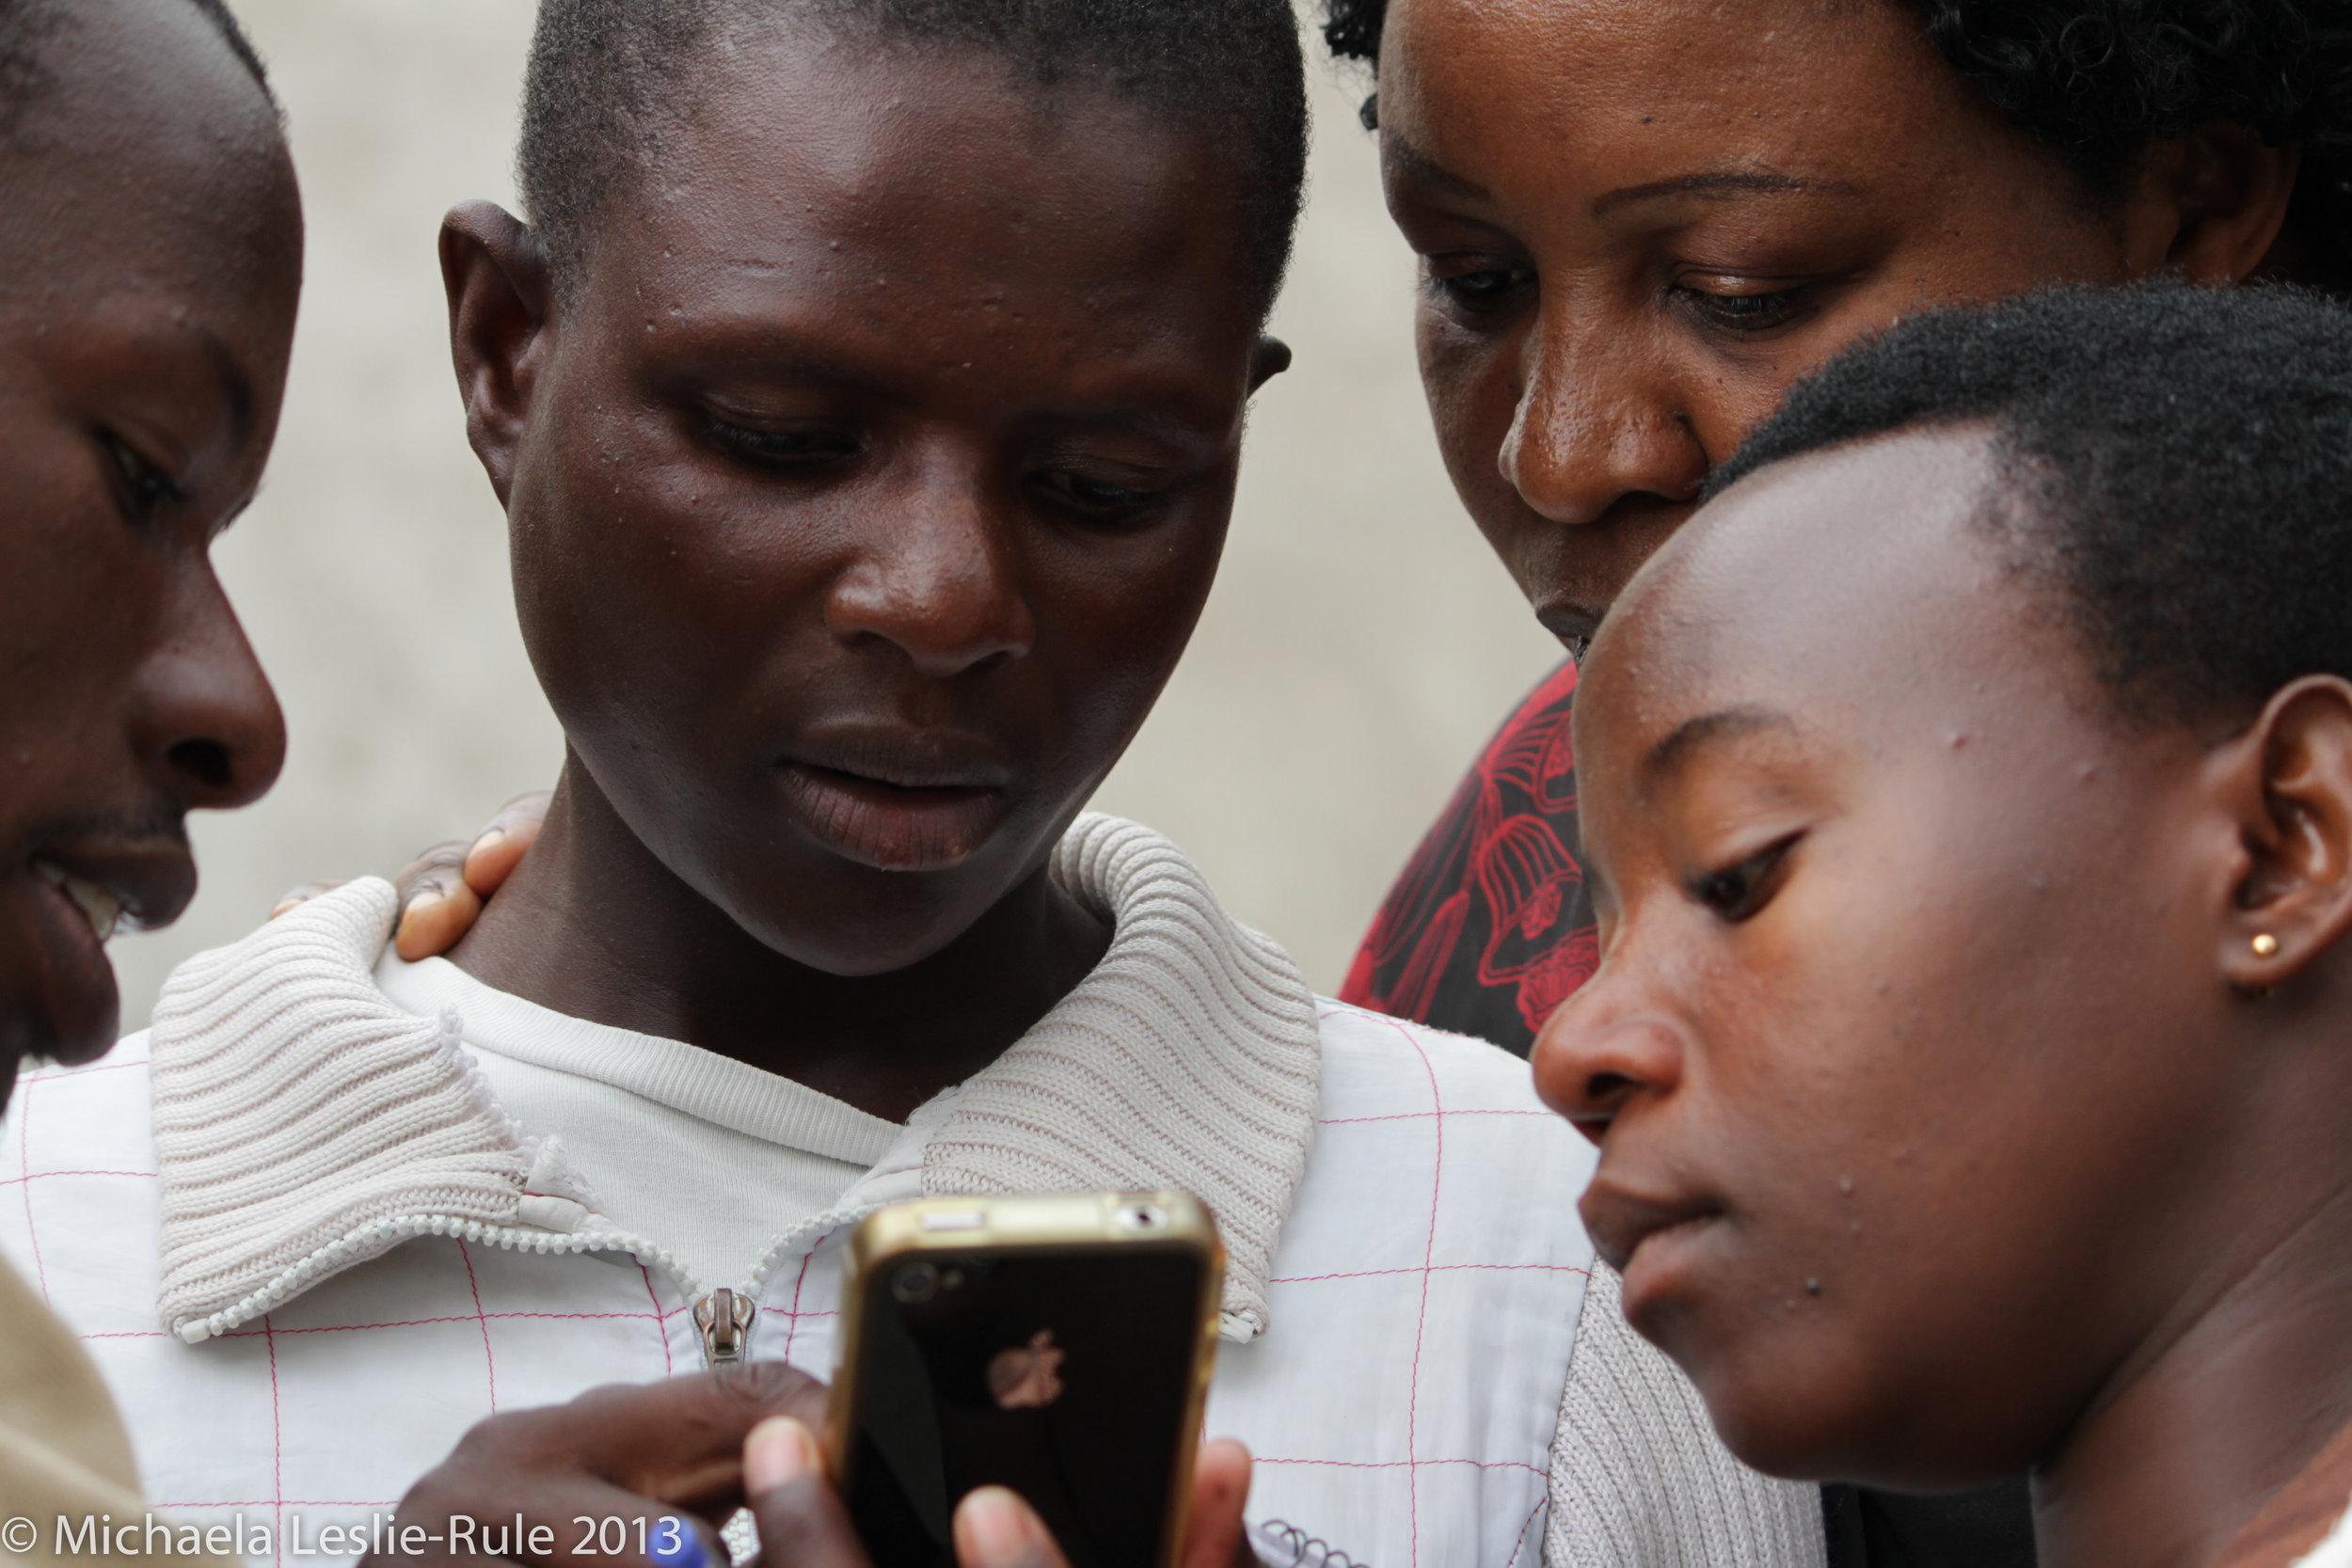 Africn girls look at an iPhone